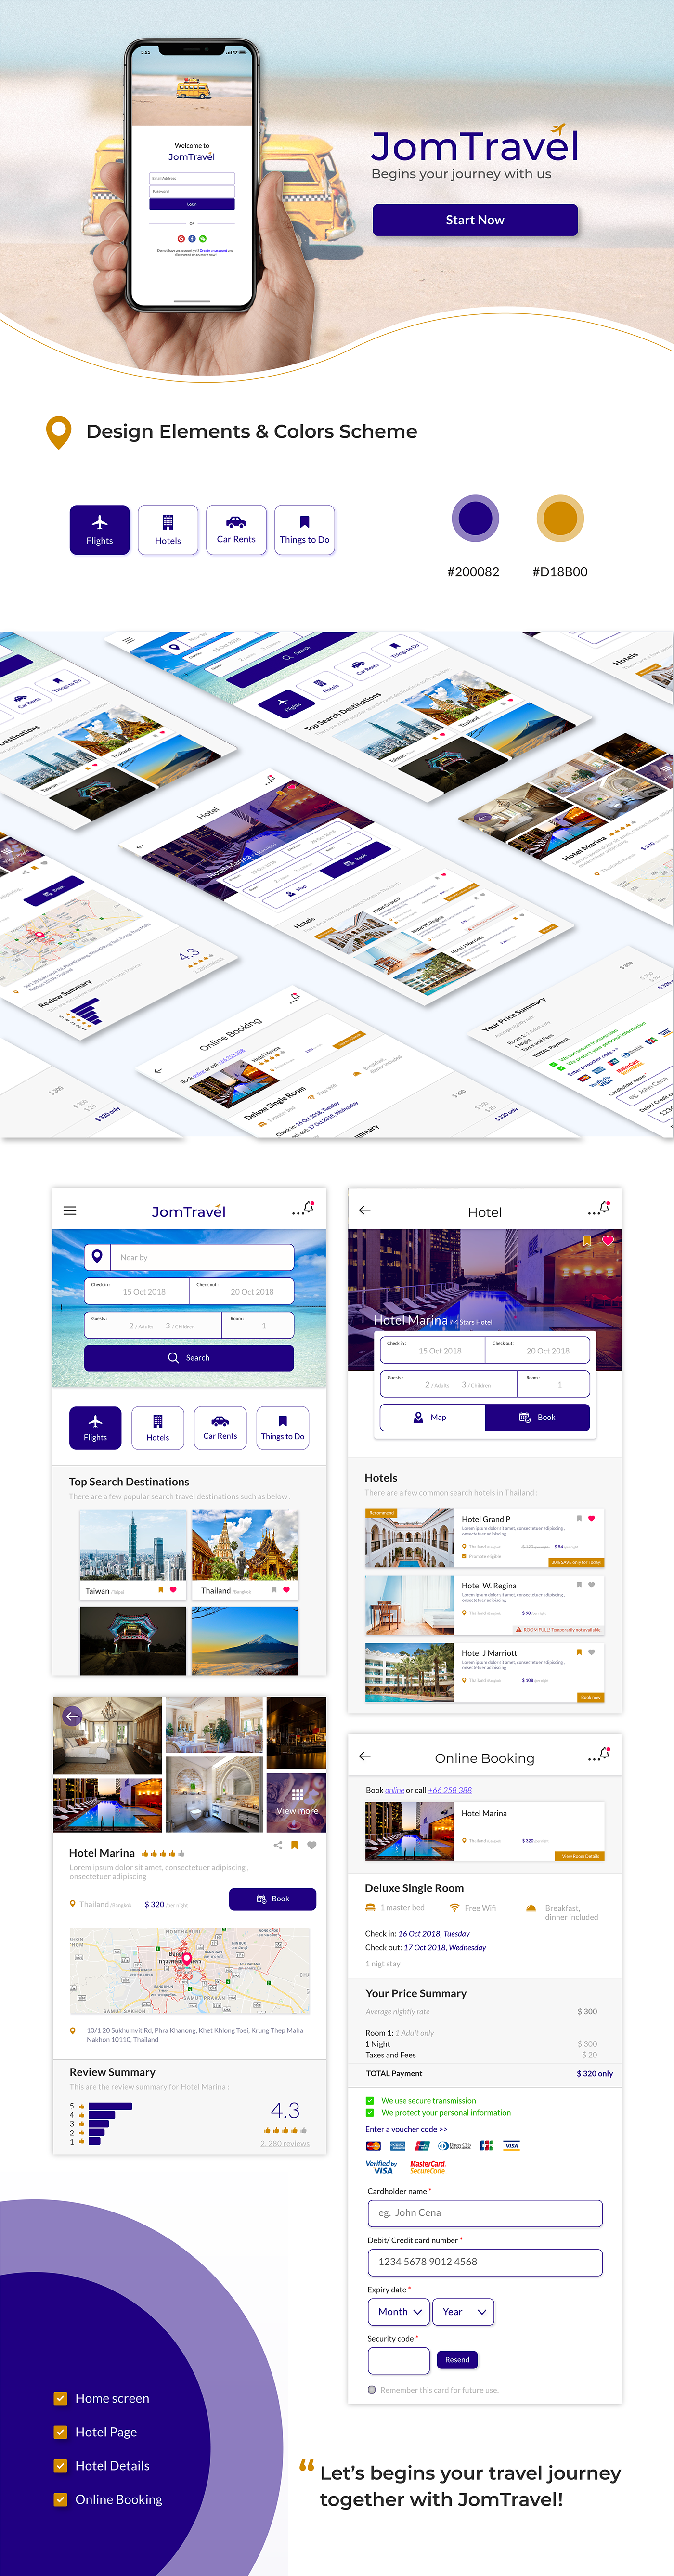 Travel Booking hotel UI/UX jomtravel Mobile App UI/UX design uxarmy